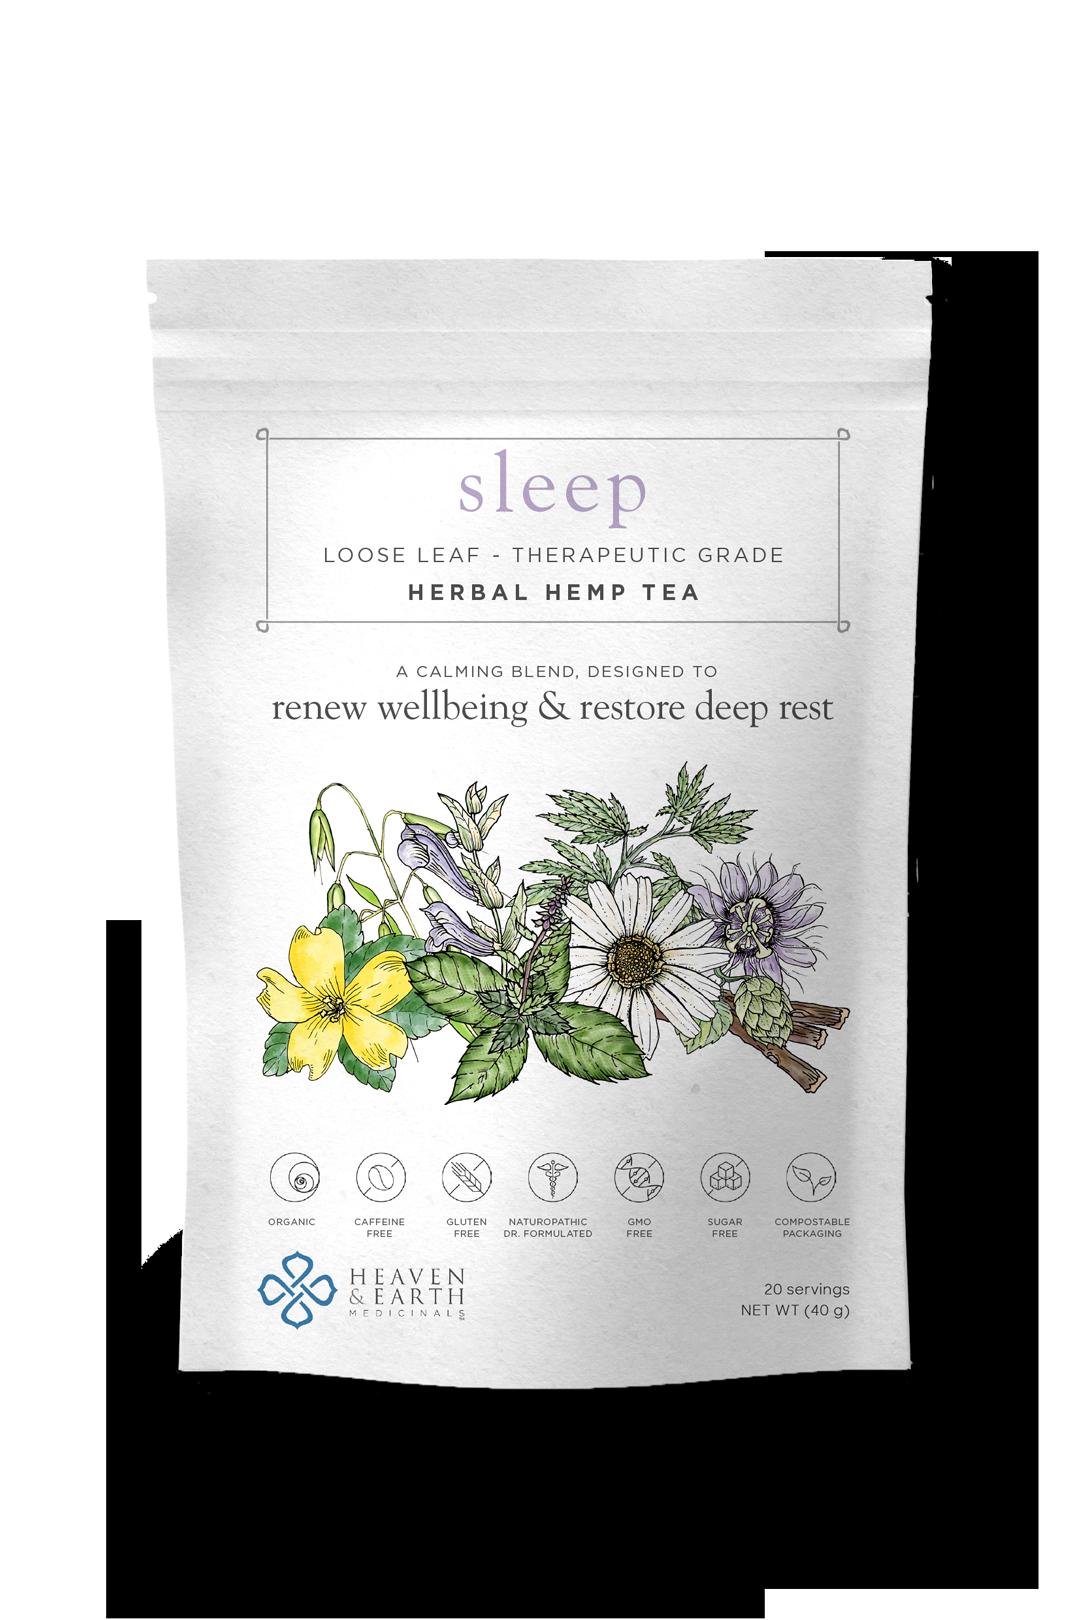 Sleep. Tea. Herb. Medicine. Insomnia. Anxiety. Tension. Dreams.